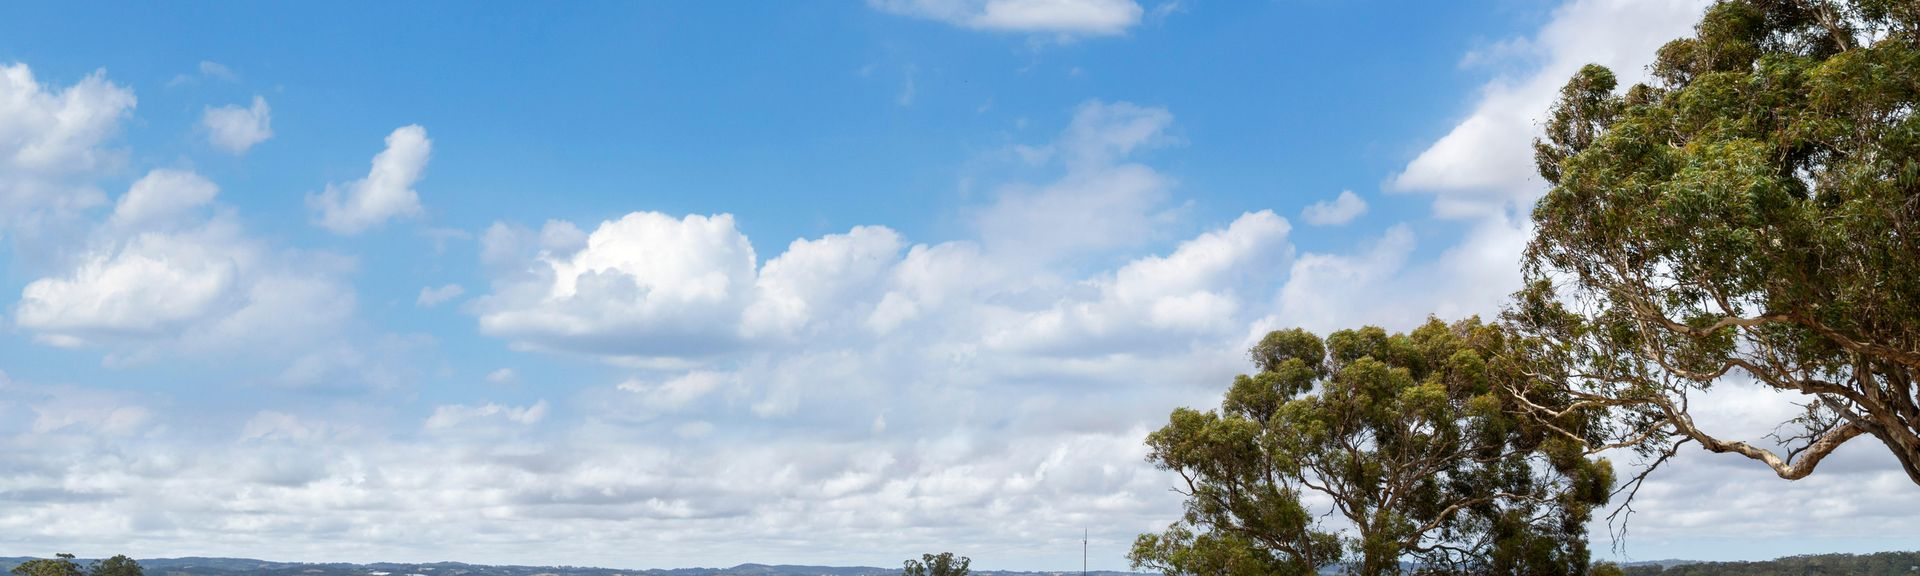 Hahndorf, South Australia, Australië